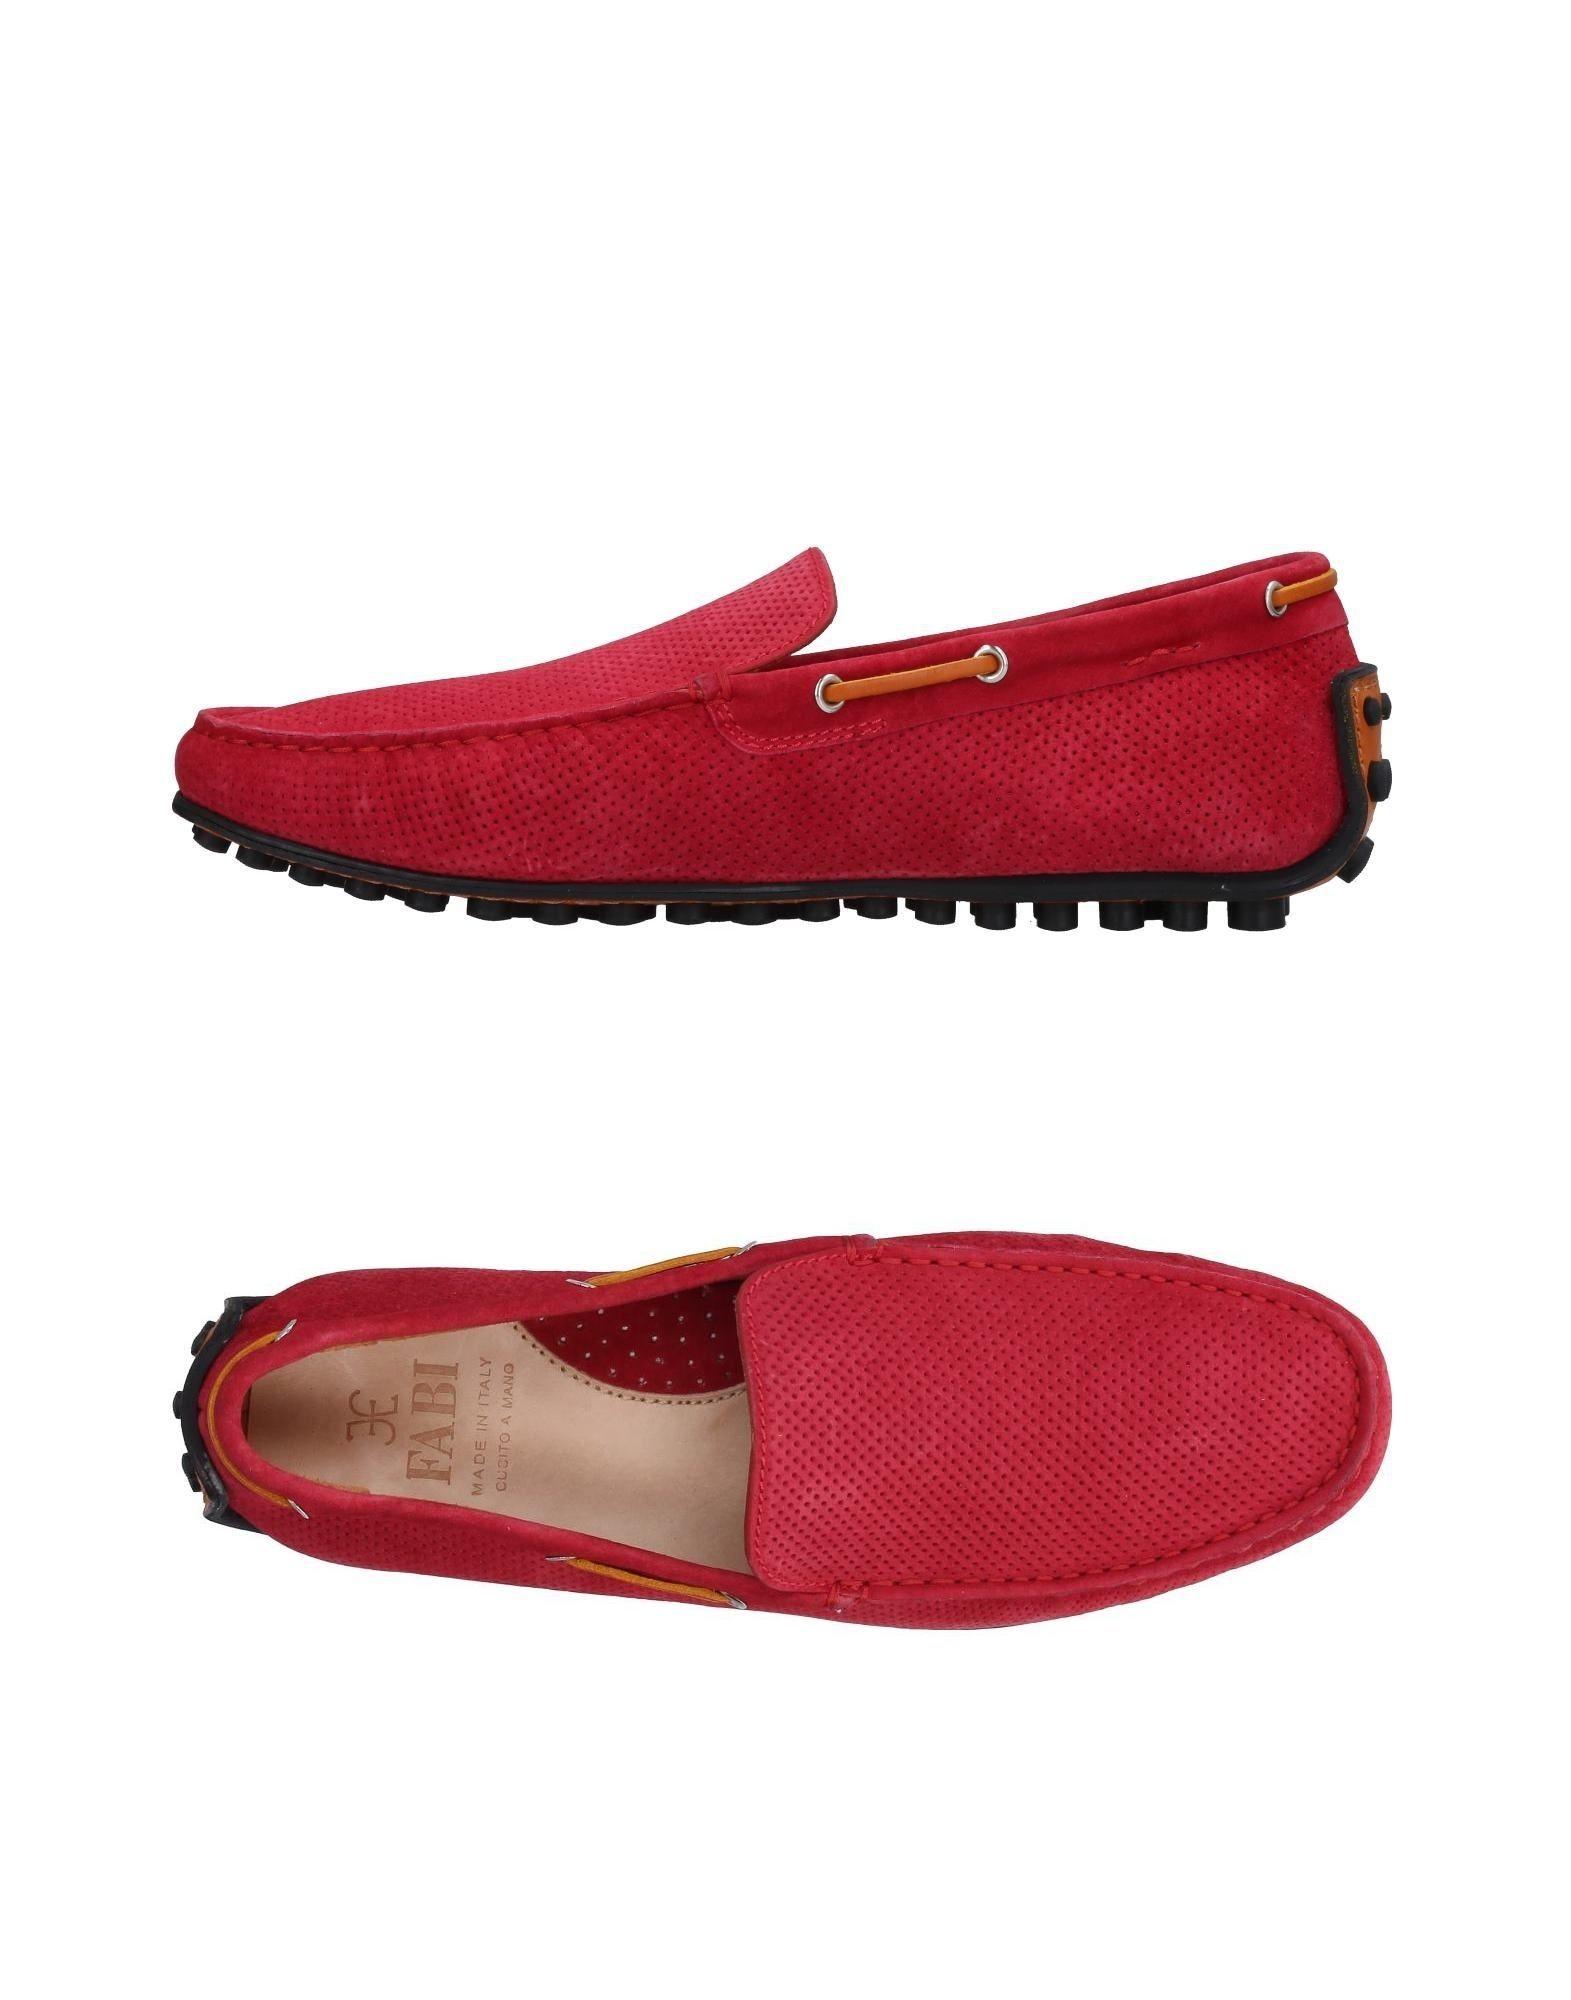 Fabi Mokassins Herren  11415893XF Gute Qualität beliebte Schuhe